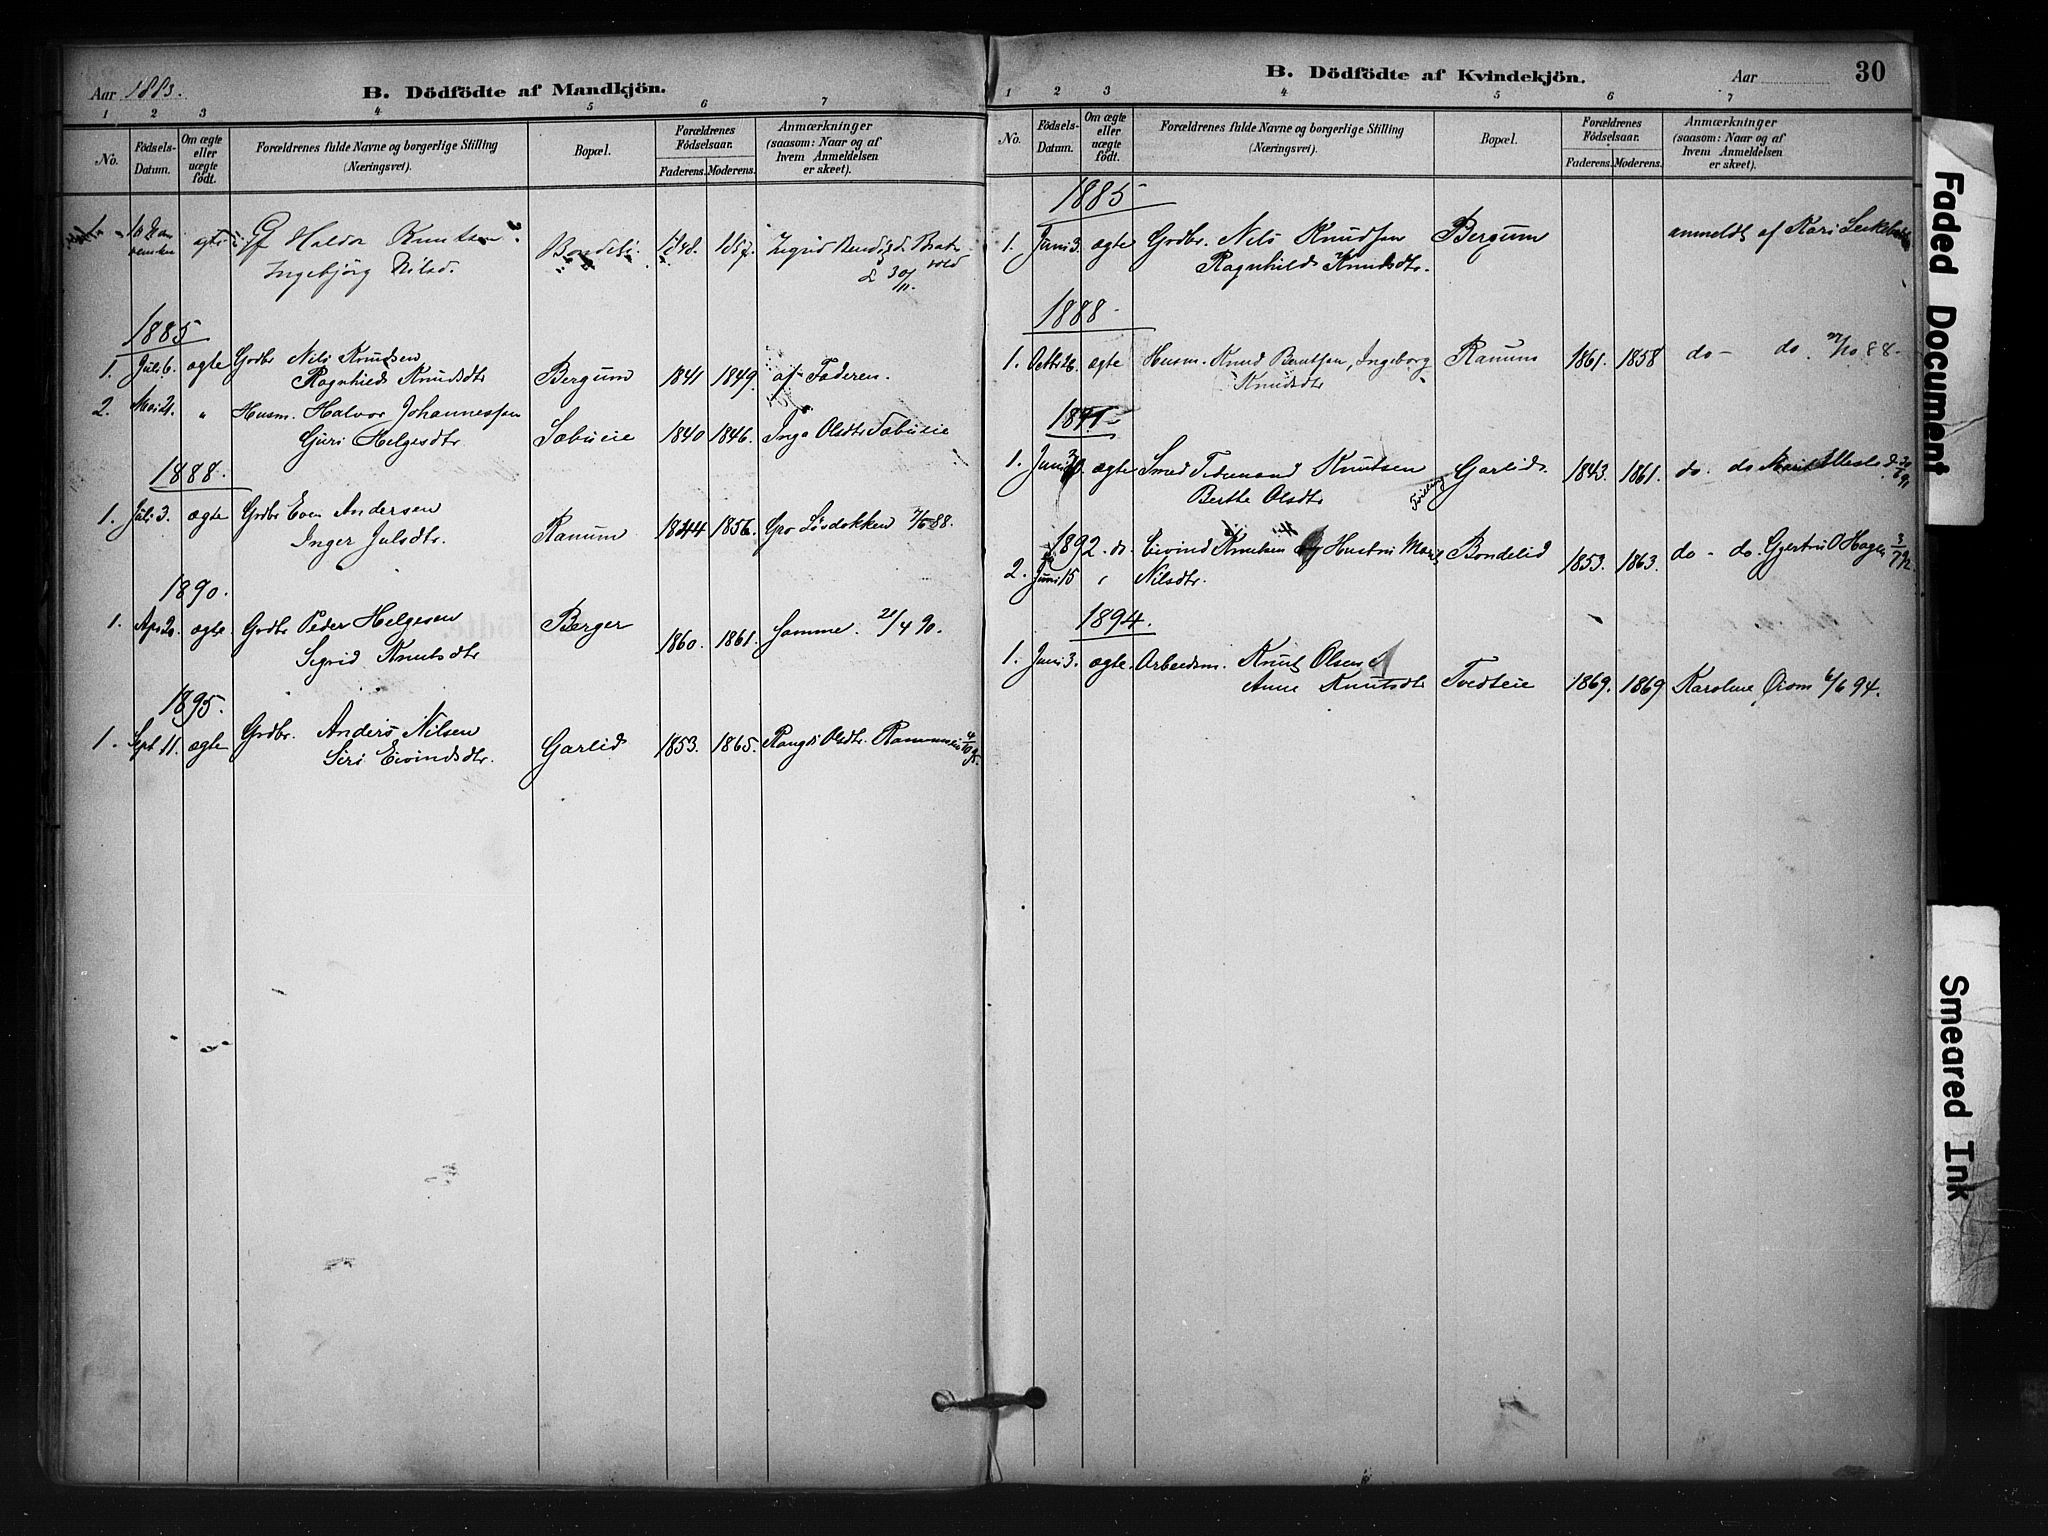 SAH, Nord-Aurdal prestekontor, Ministerialbok nr. 12, 1883-1895, s. 30